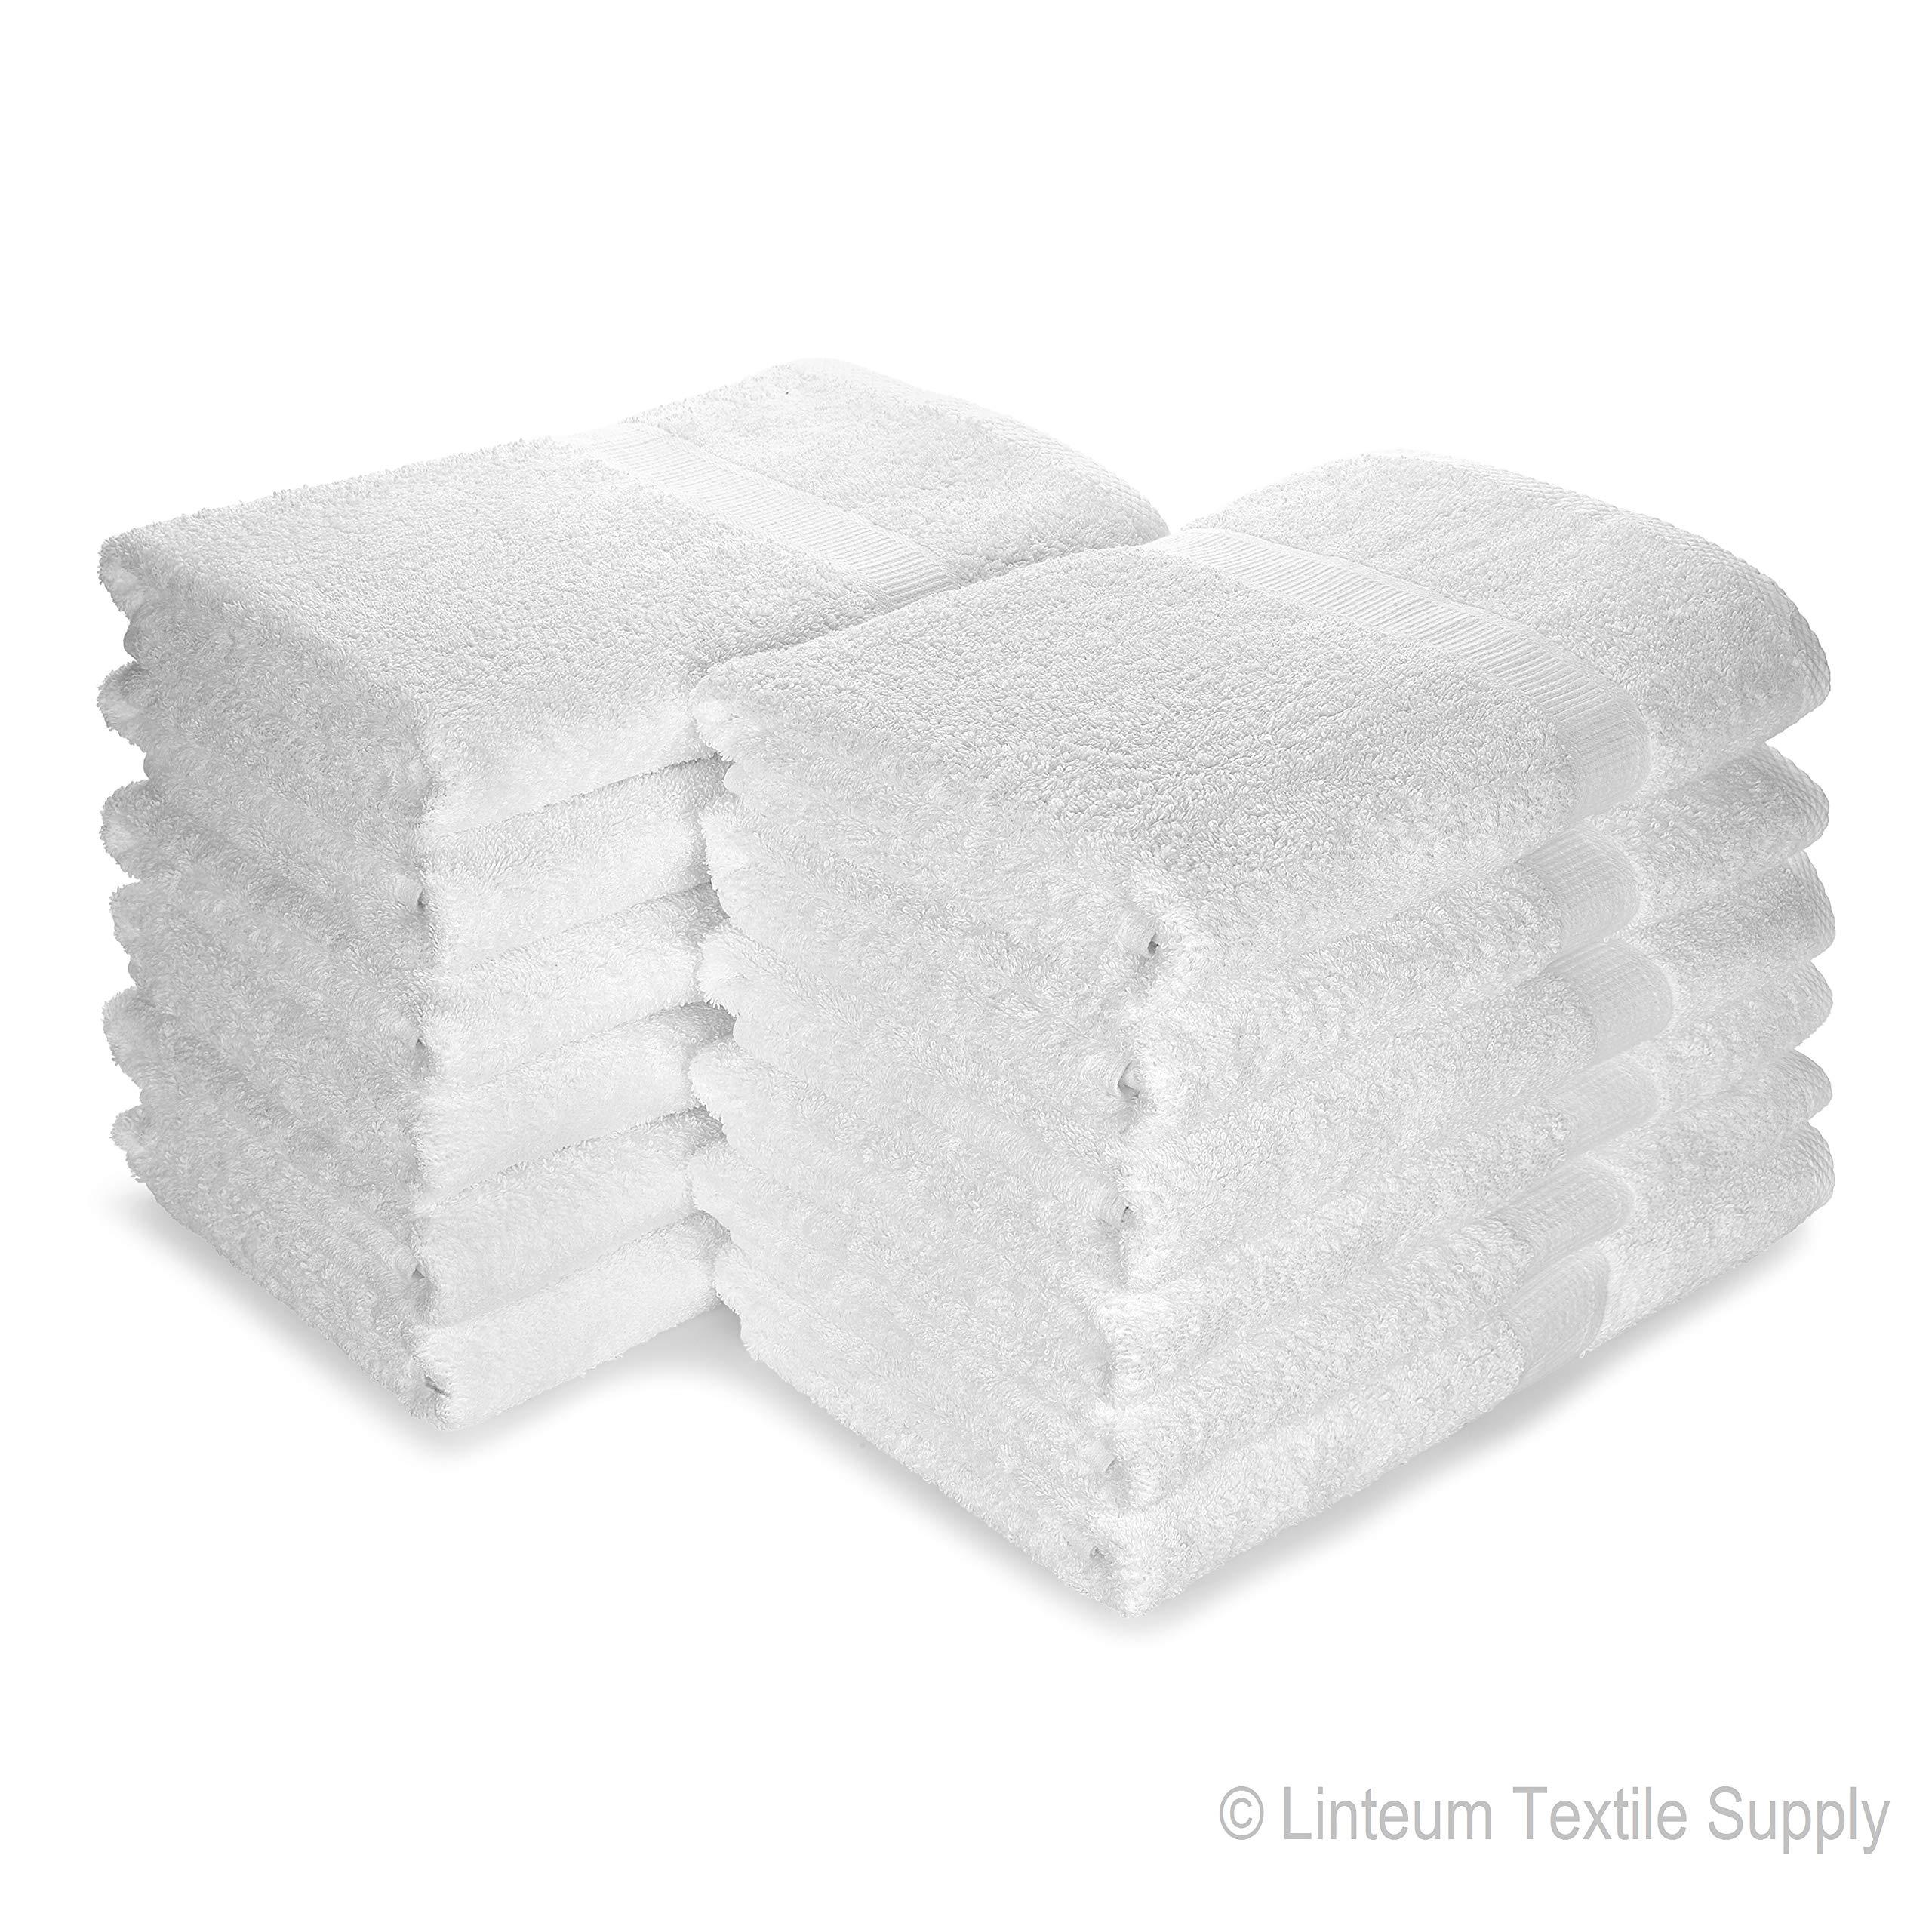 Linteum Textile (12-Pack, 24x48 in, White) Hotel-Quality Bath Towels, 100% Soft Cotton